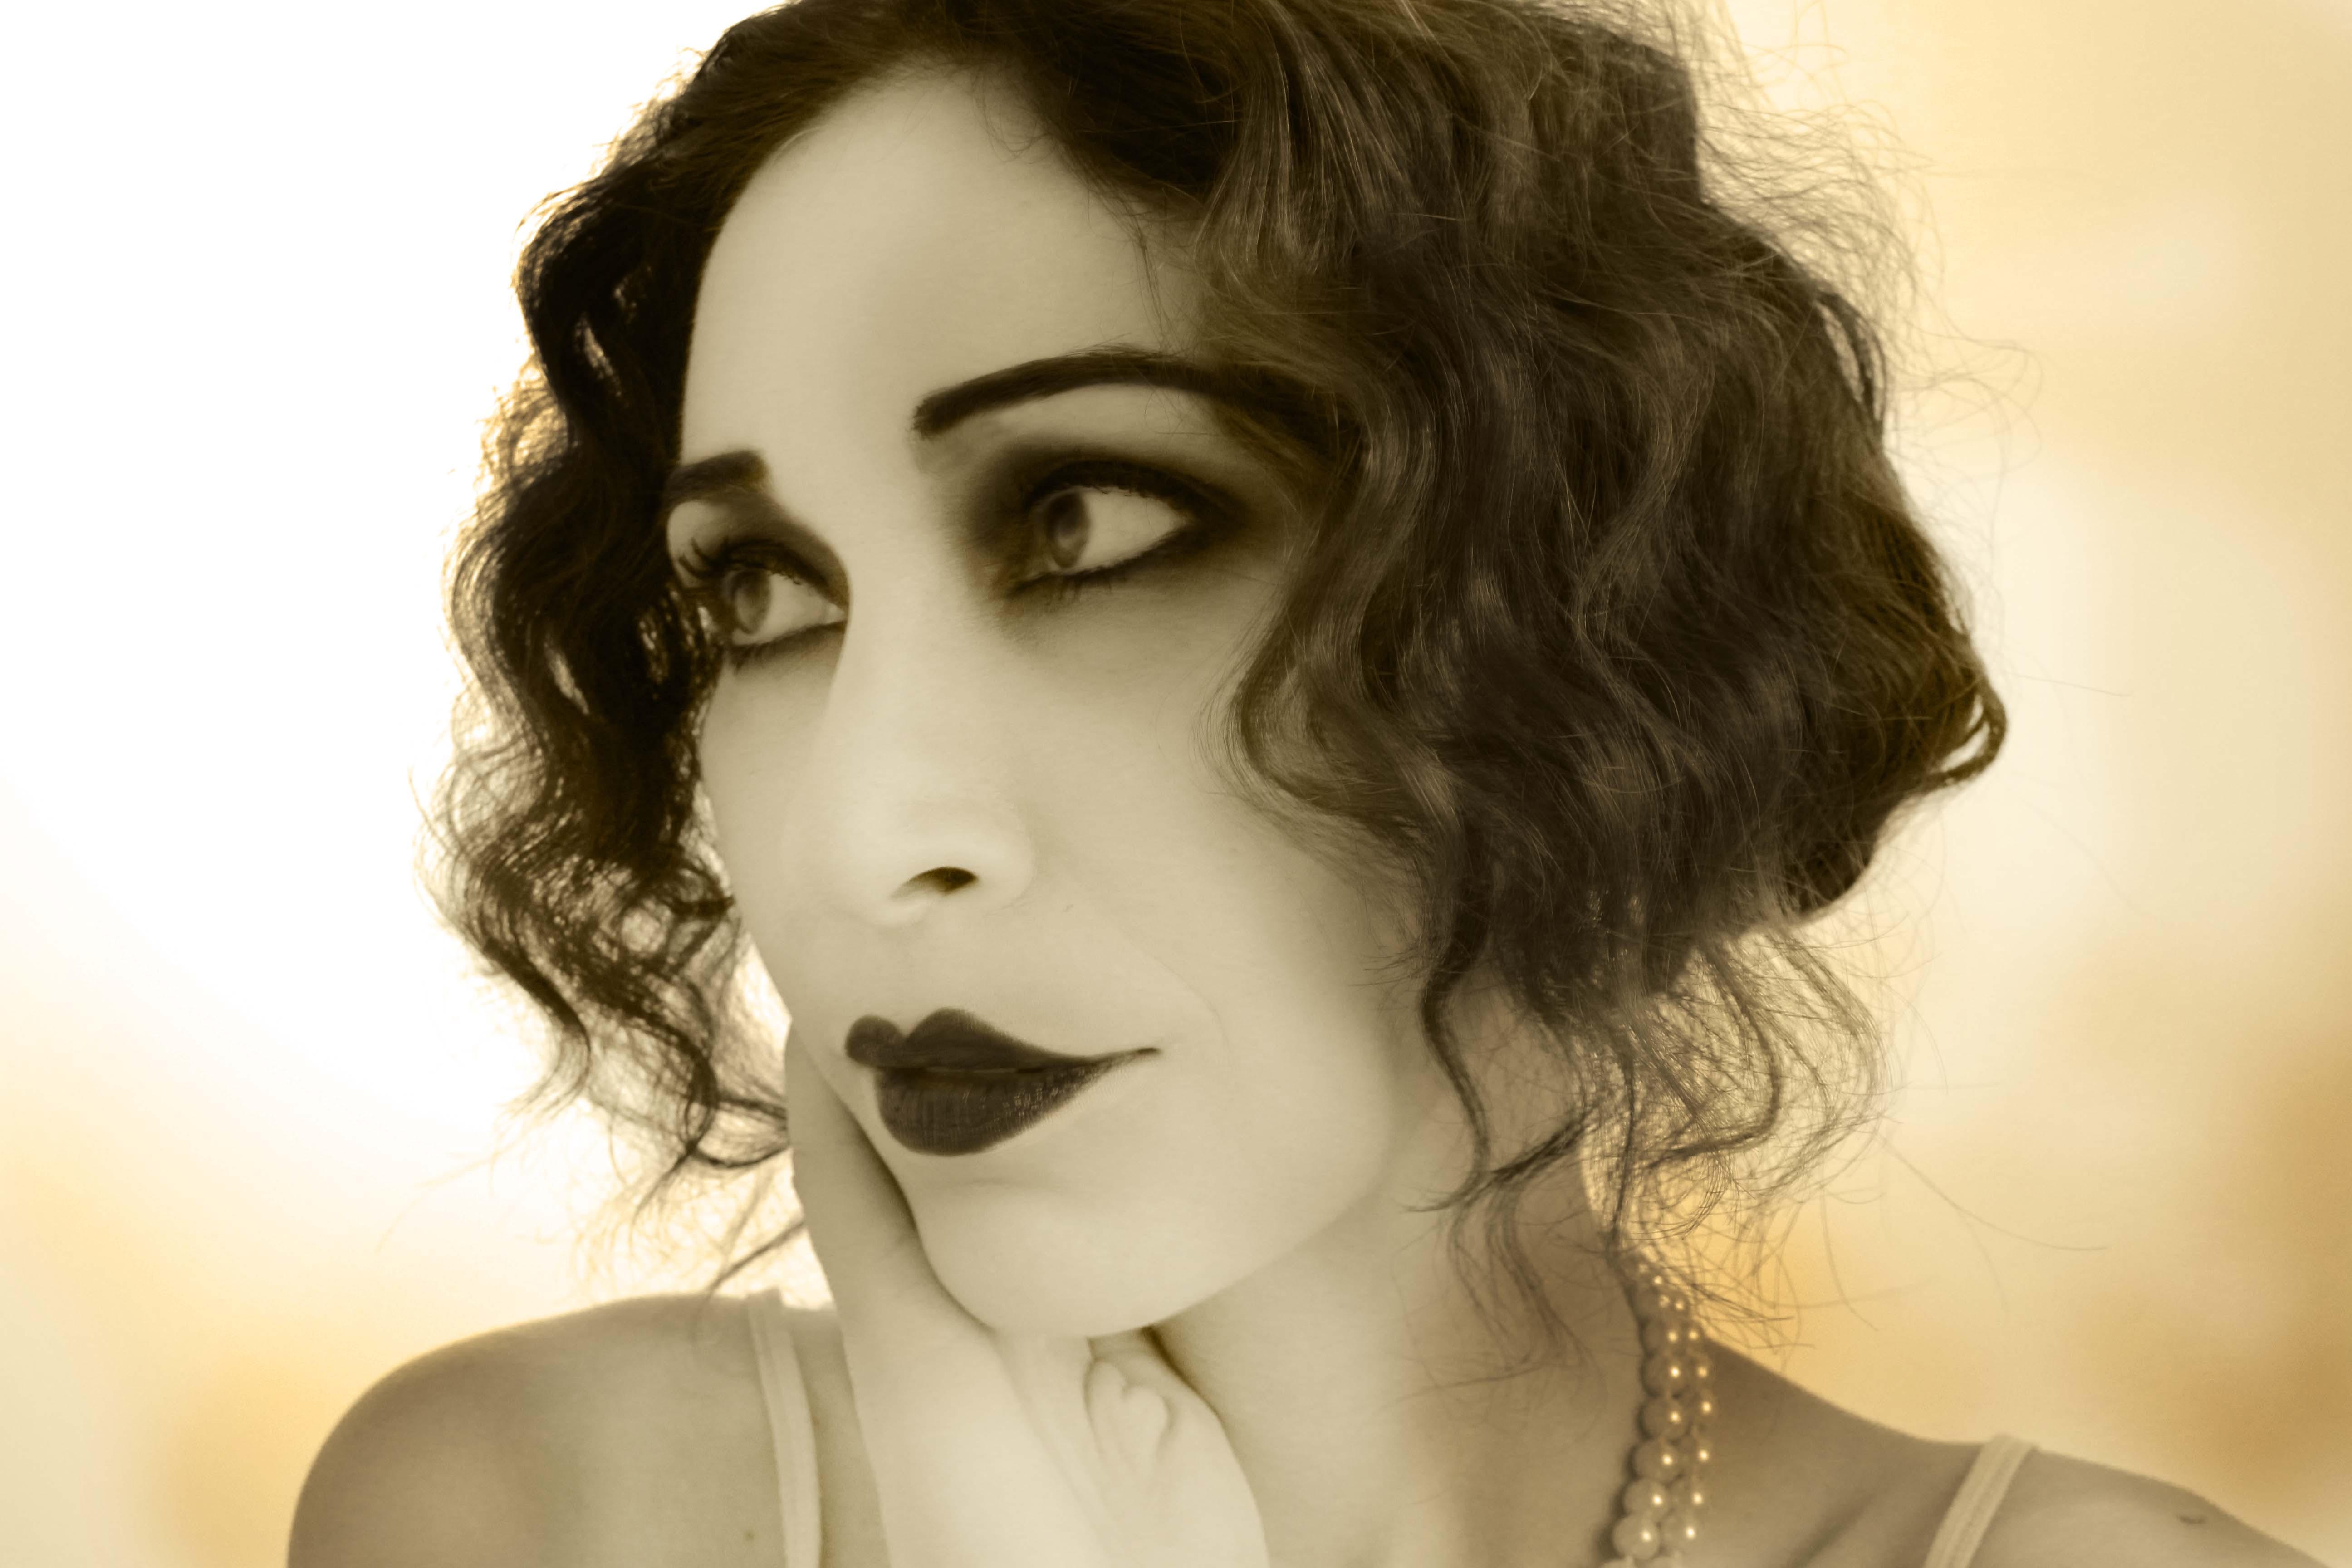 immagine stile foto 1920 trucco d'epoca sfumature make up & beauty